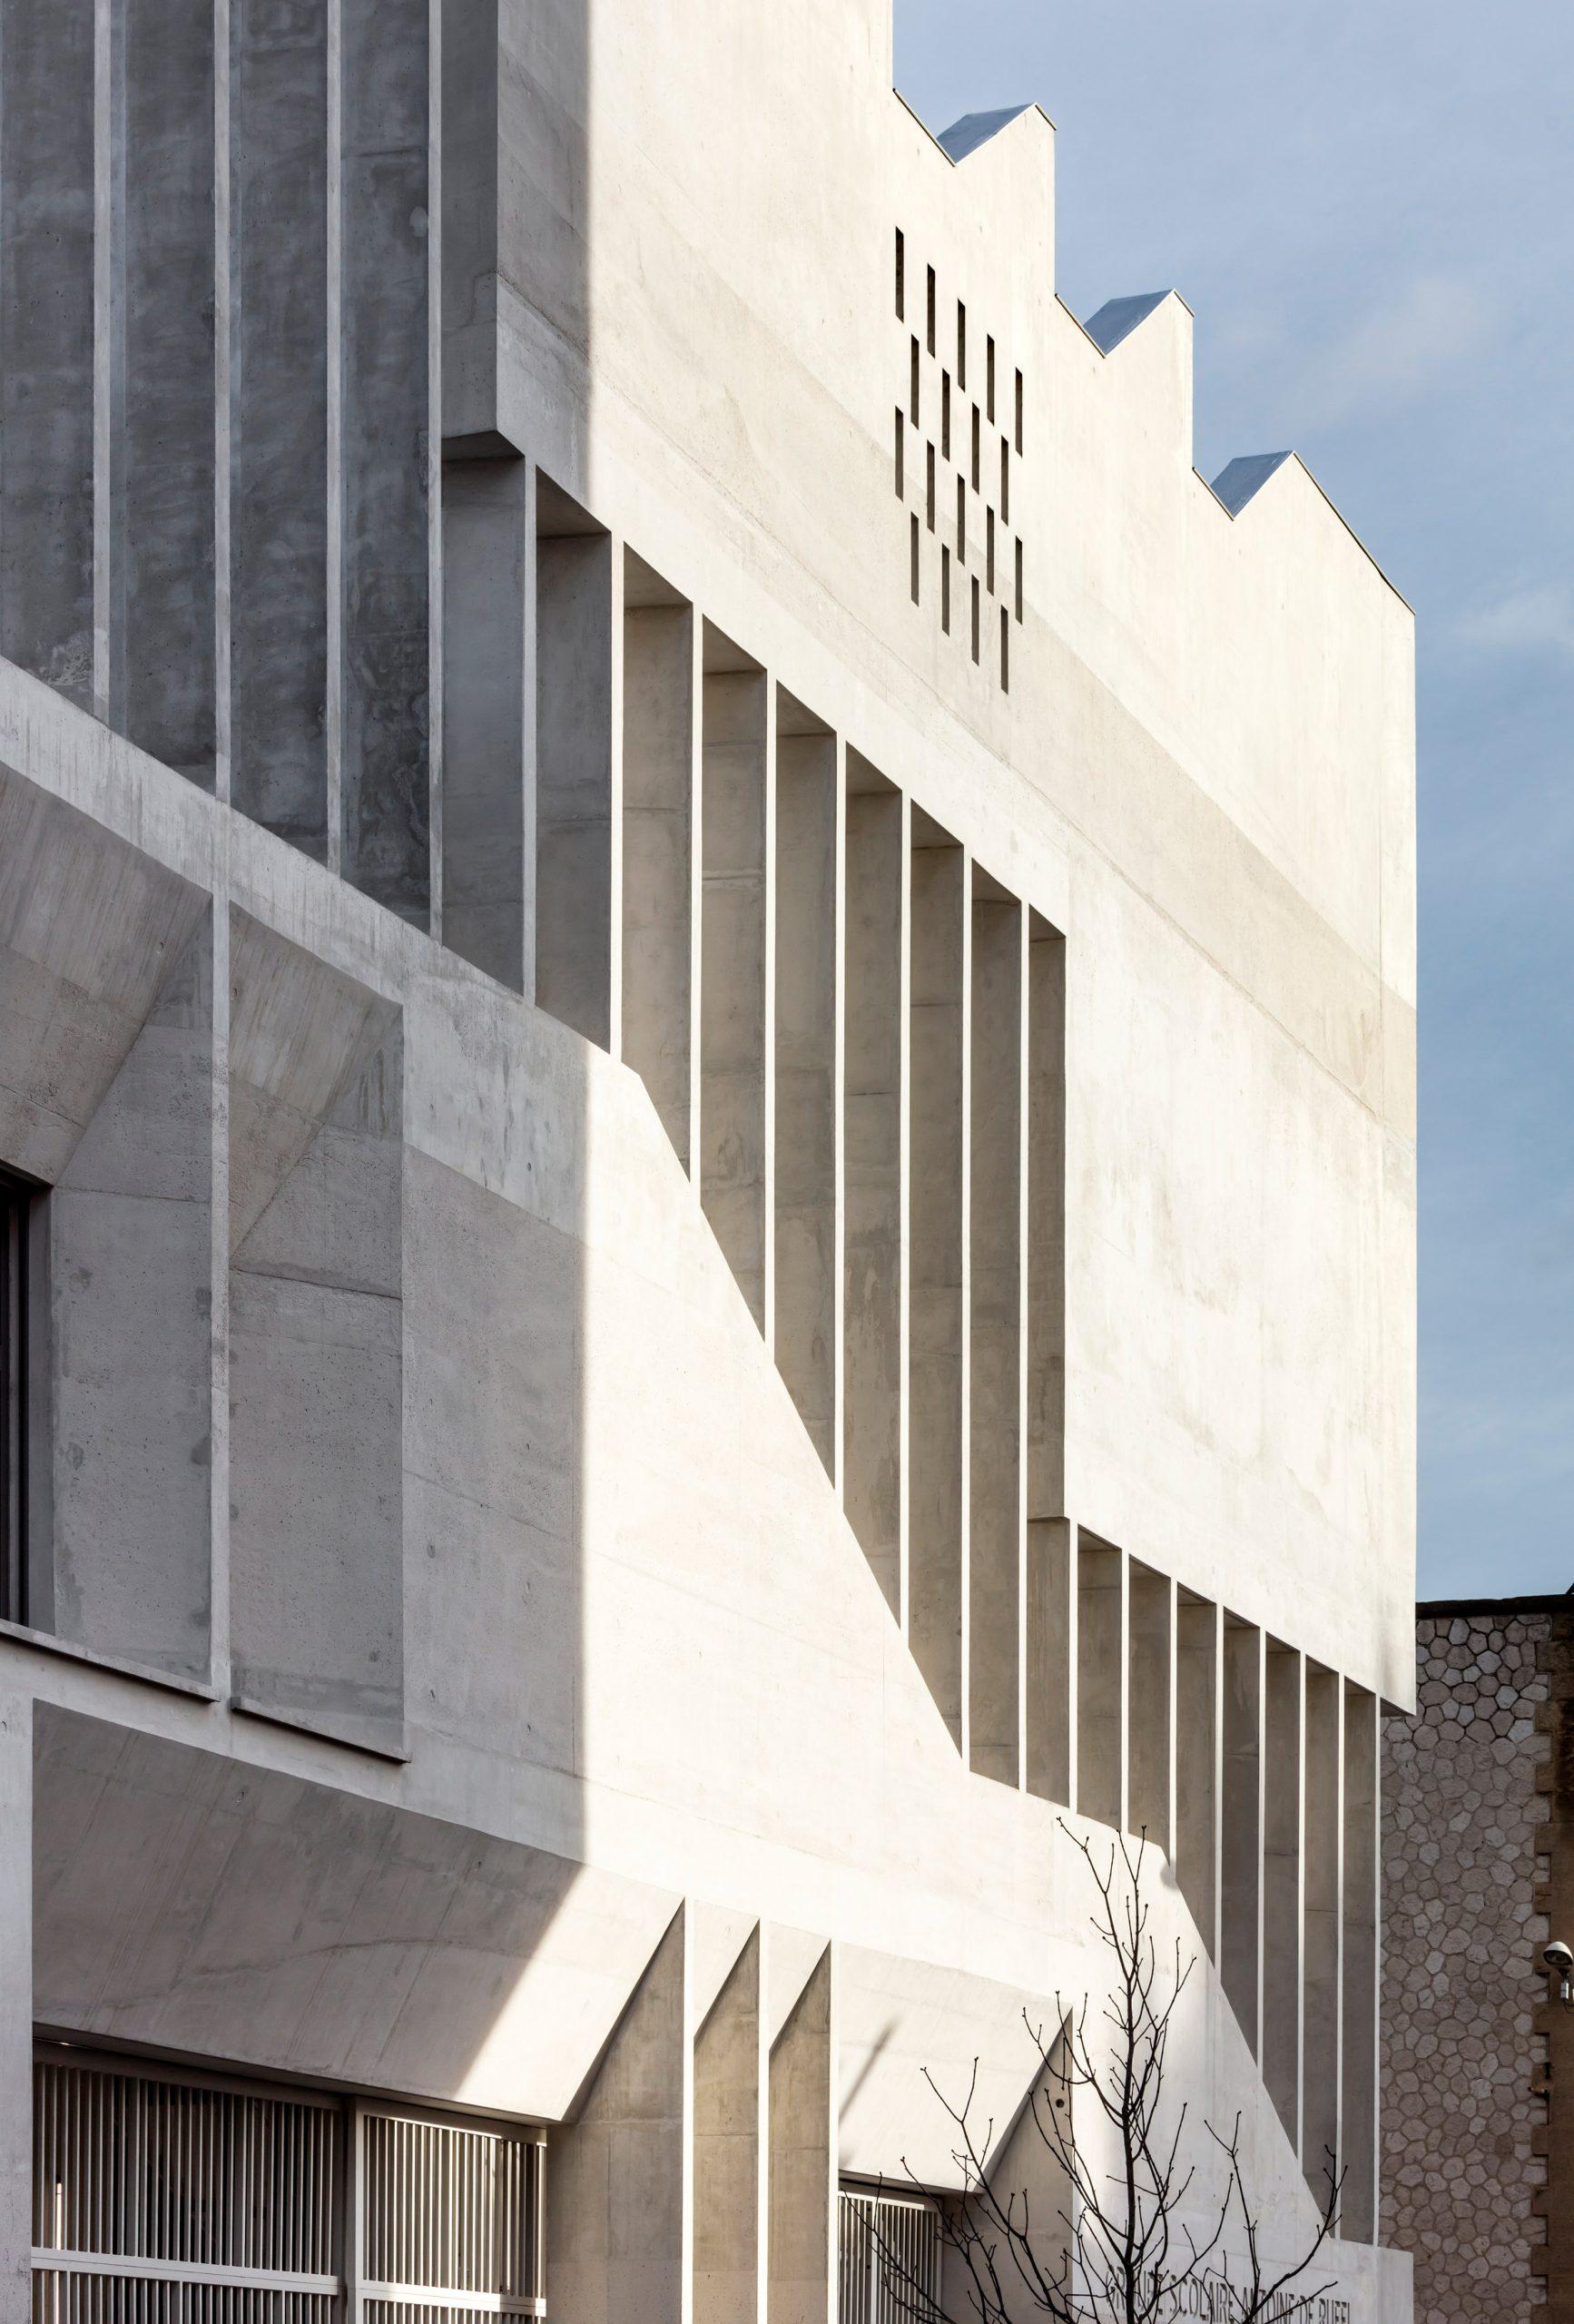 Light hits the building forming geometric shadows